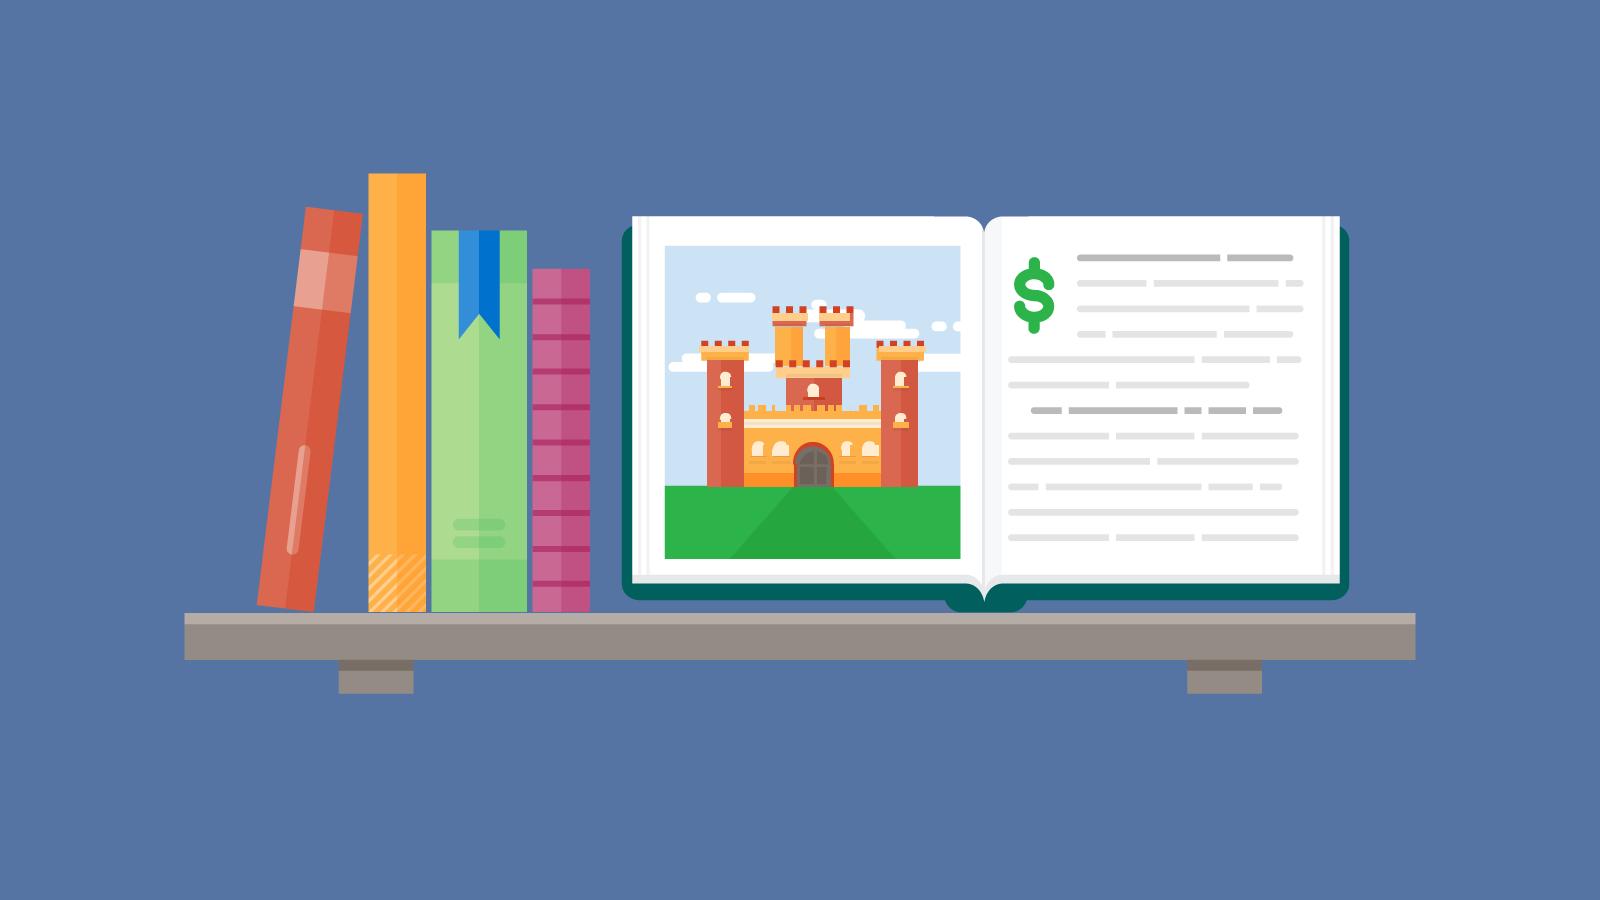 Money as You Grow Book Club illustration